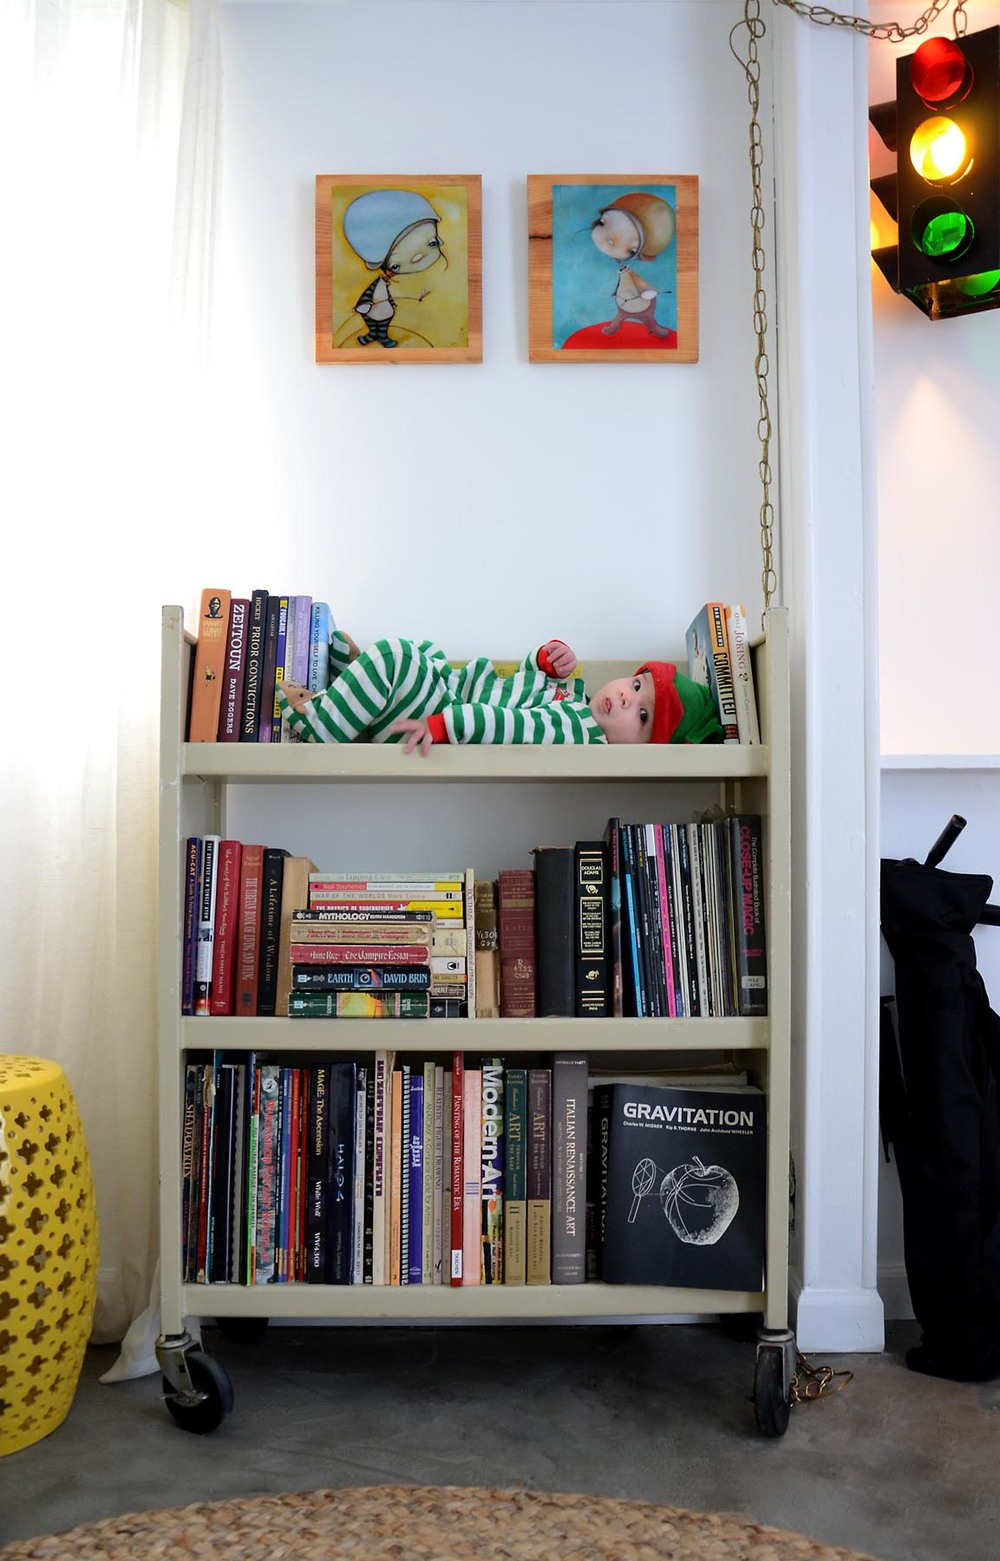 london on a shelf.jpg